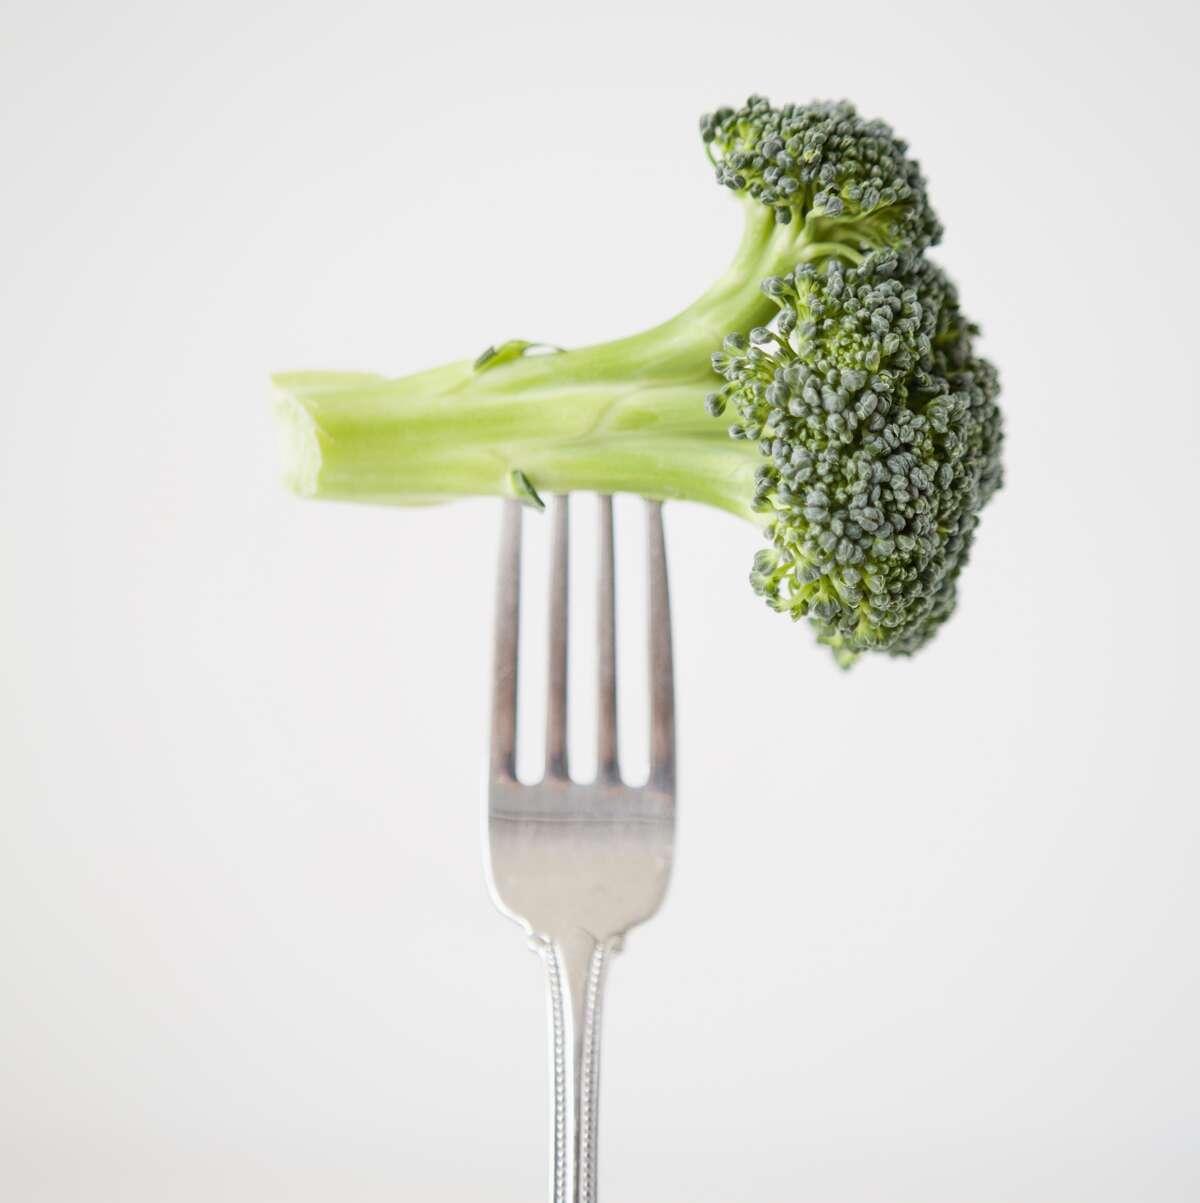 Despite an interest in vegetable-forward restaurants, Americans are still not having enough vegetables.